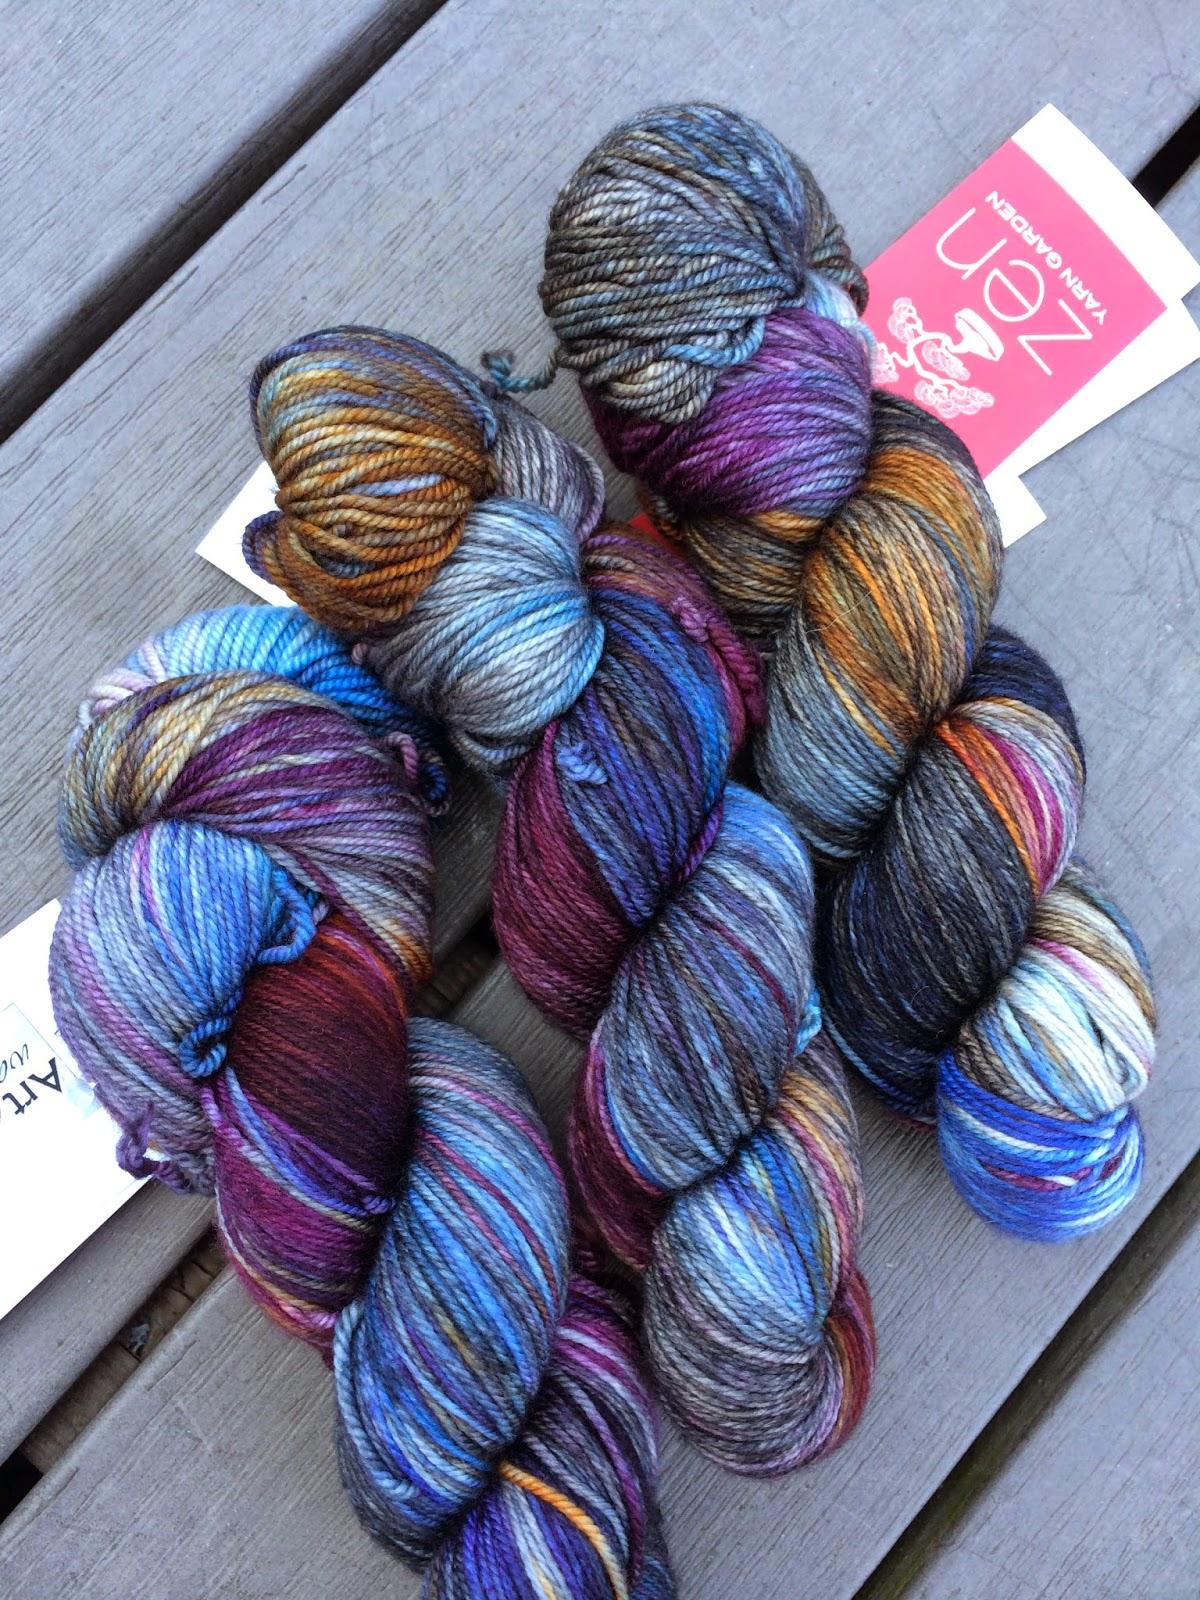 Knitting Yrn K2tog : A really good yarn vacation knitting